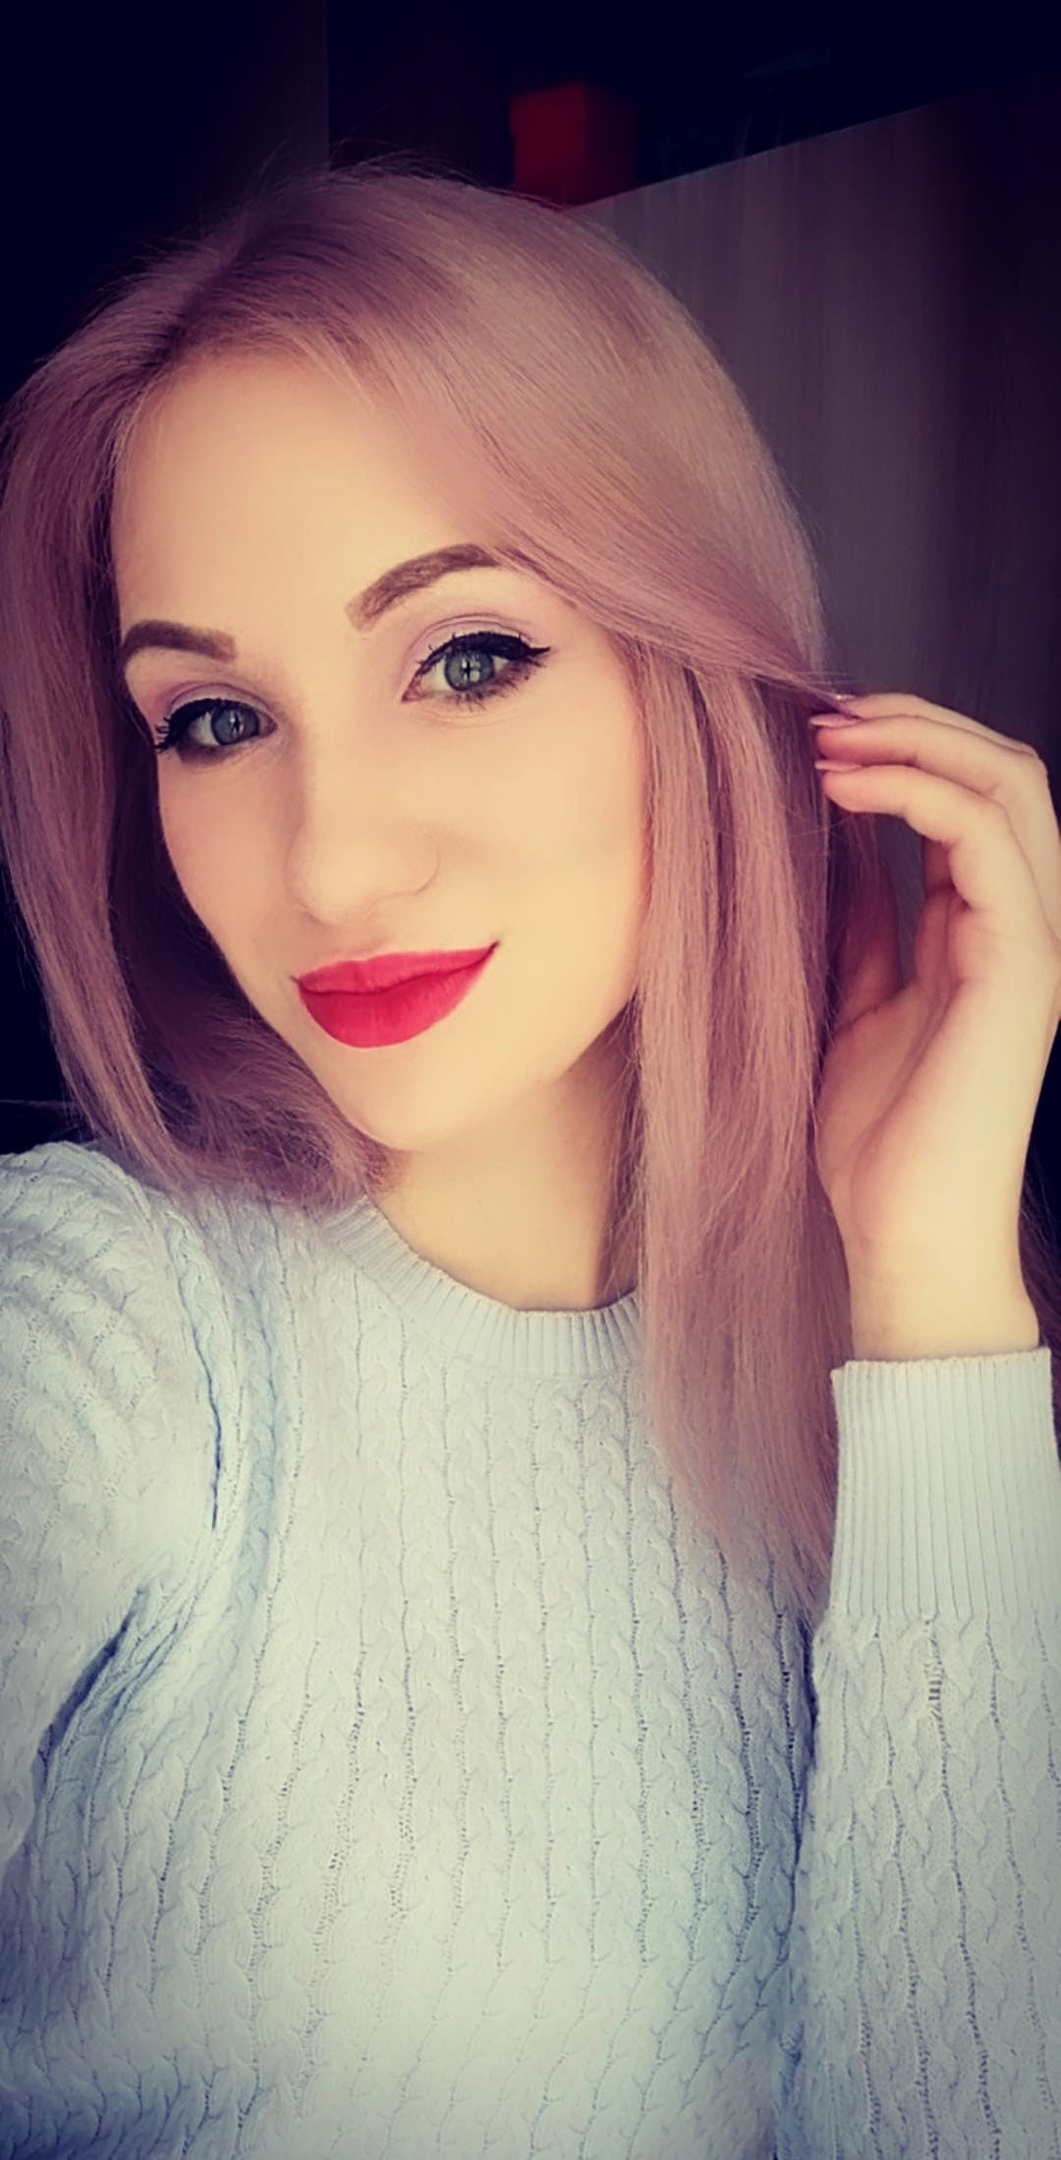 Galina, 23, Oryol